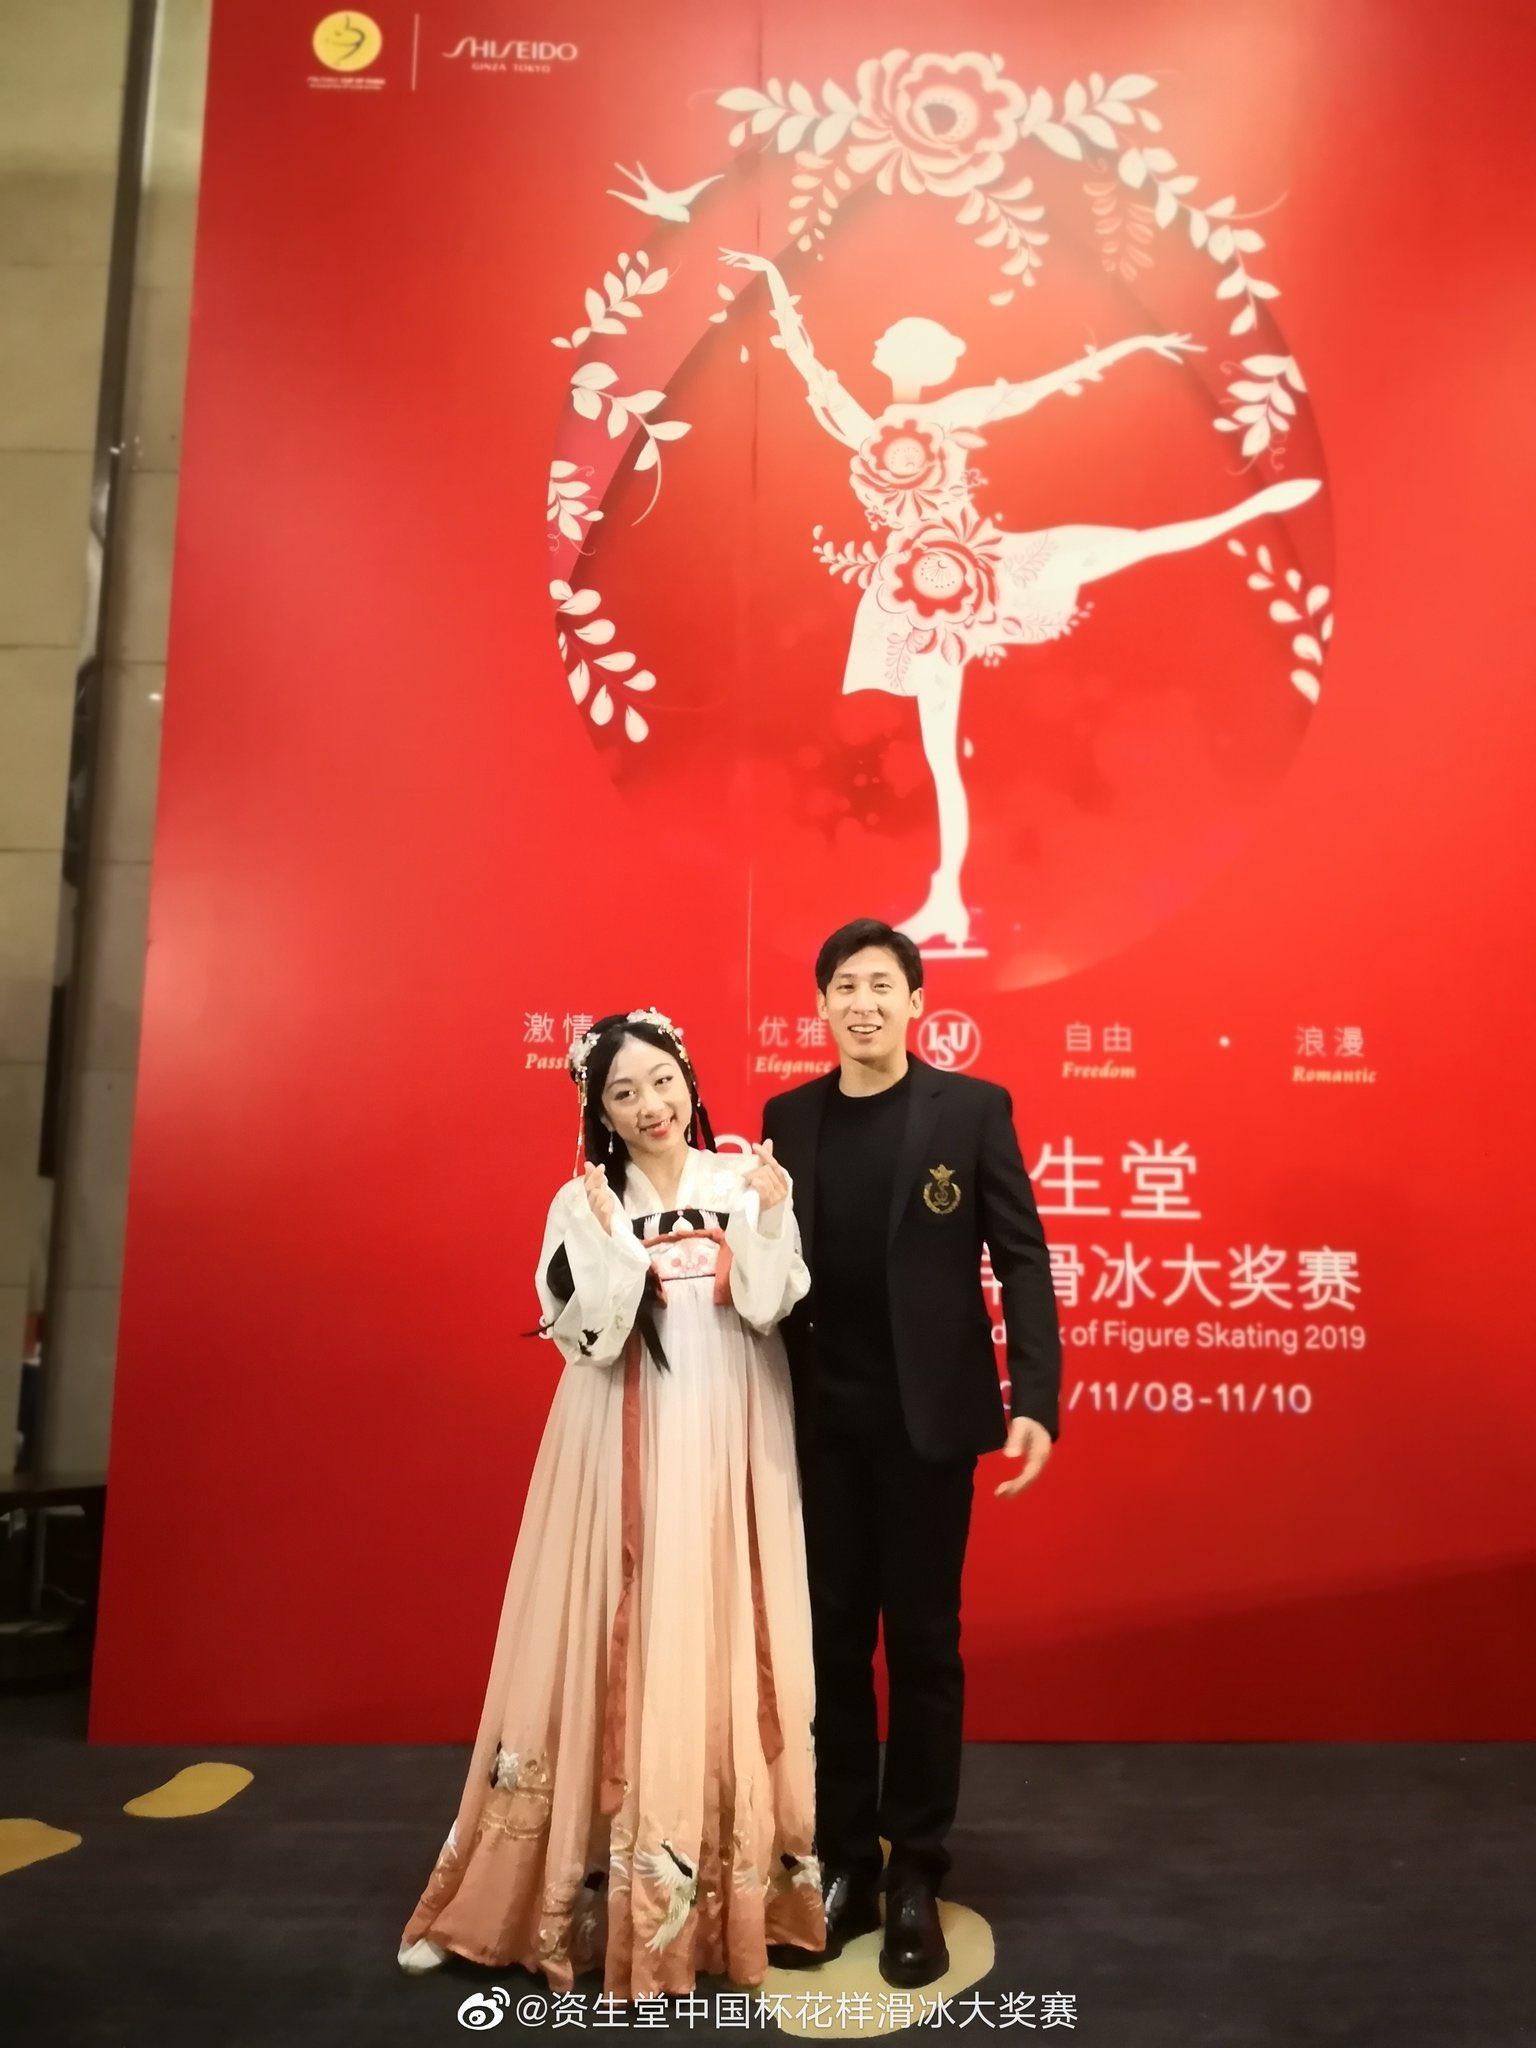 GP - 4 этап. Cup of China Chongqing / CHN November 8-10, 2019 - Страница 13 EJBEYUuU0AEu_u3?format=jpg&name=4096x4096